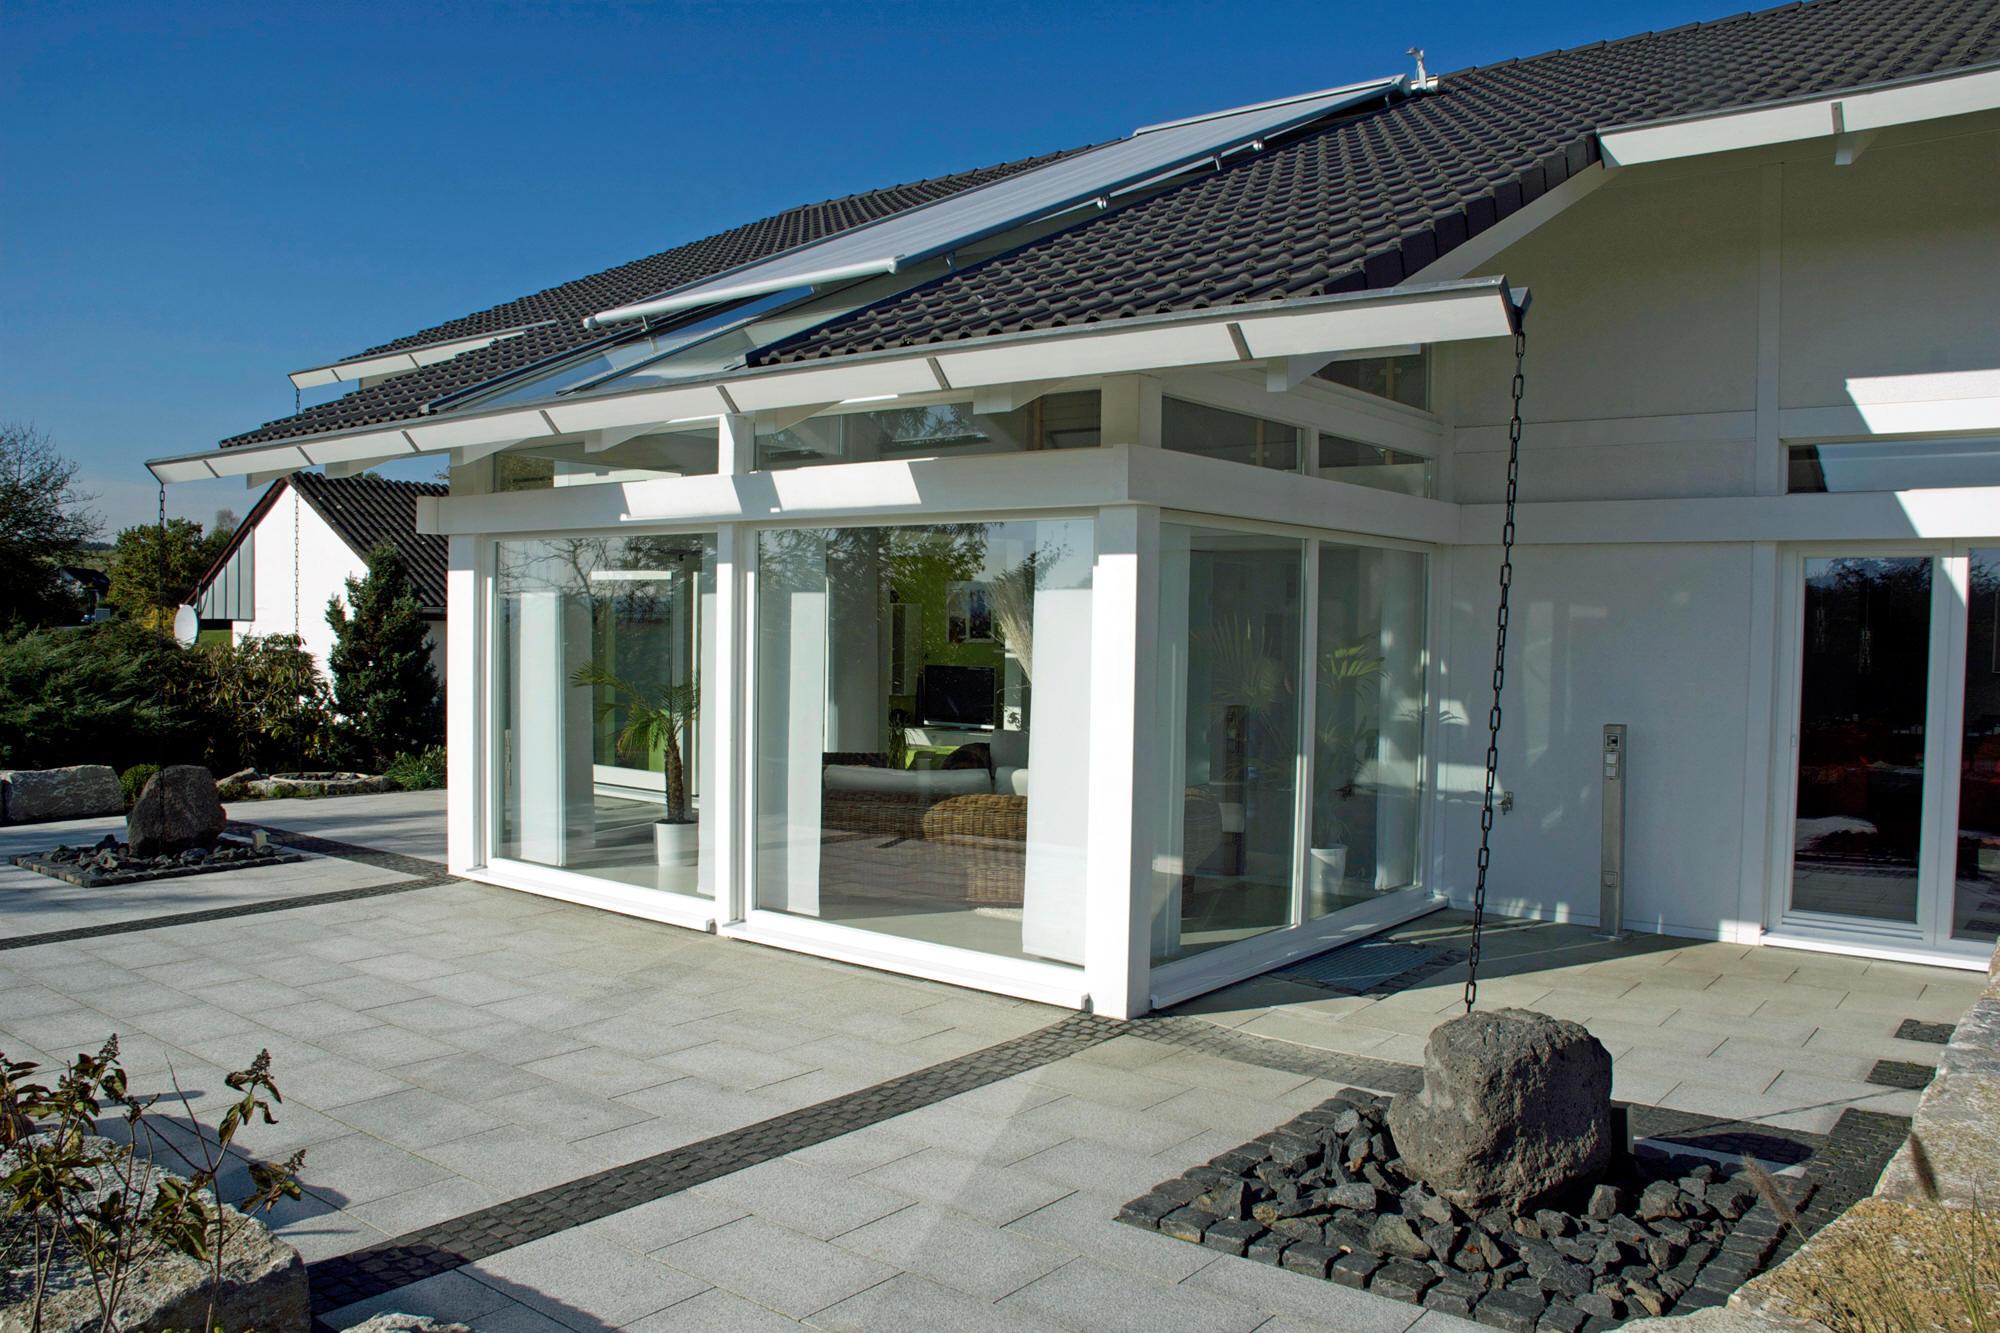 modernes holzskeletthaus kd 212 kd haus. Black Bedroom Furniture Sets. Home Design Ideas